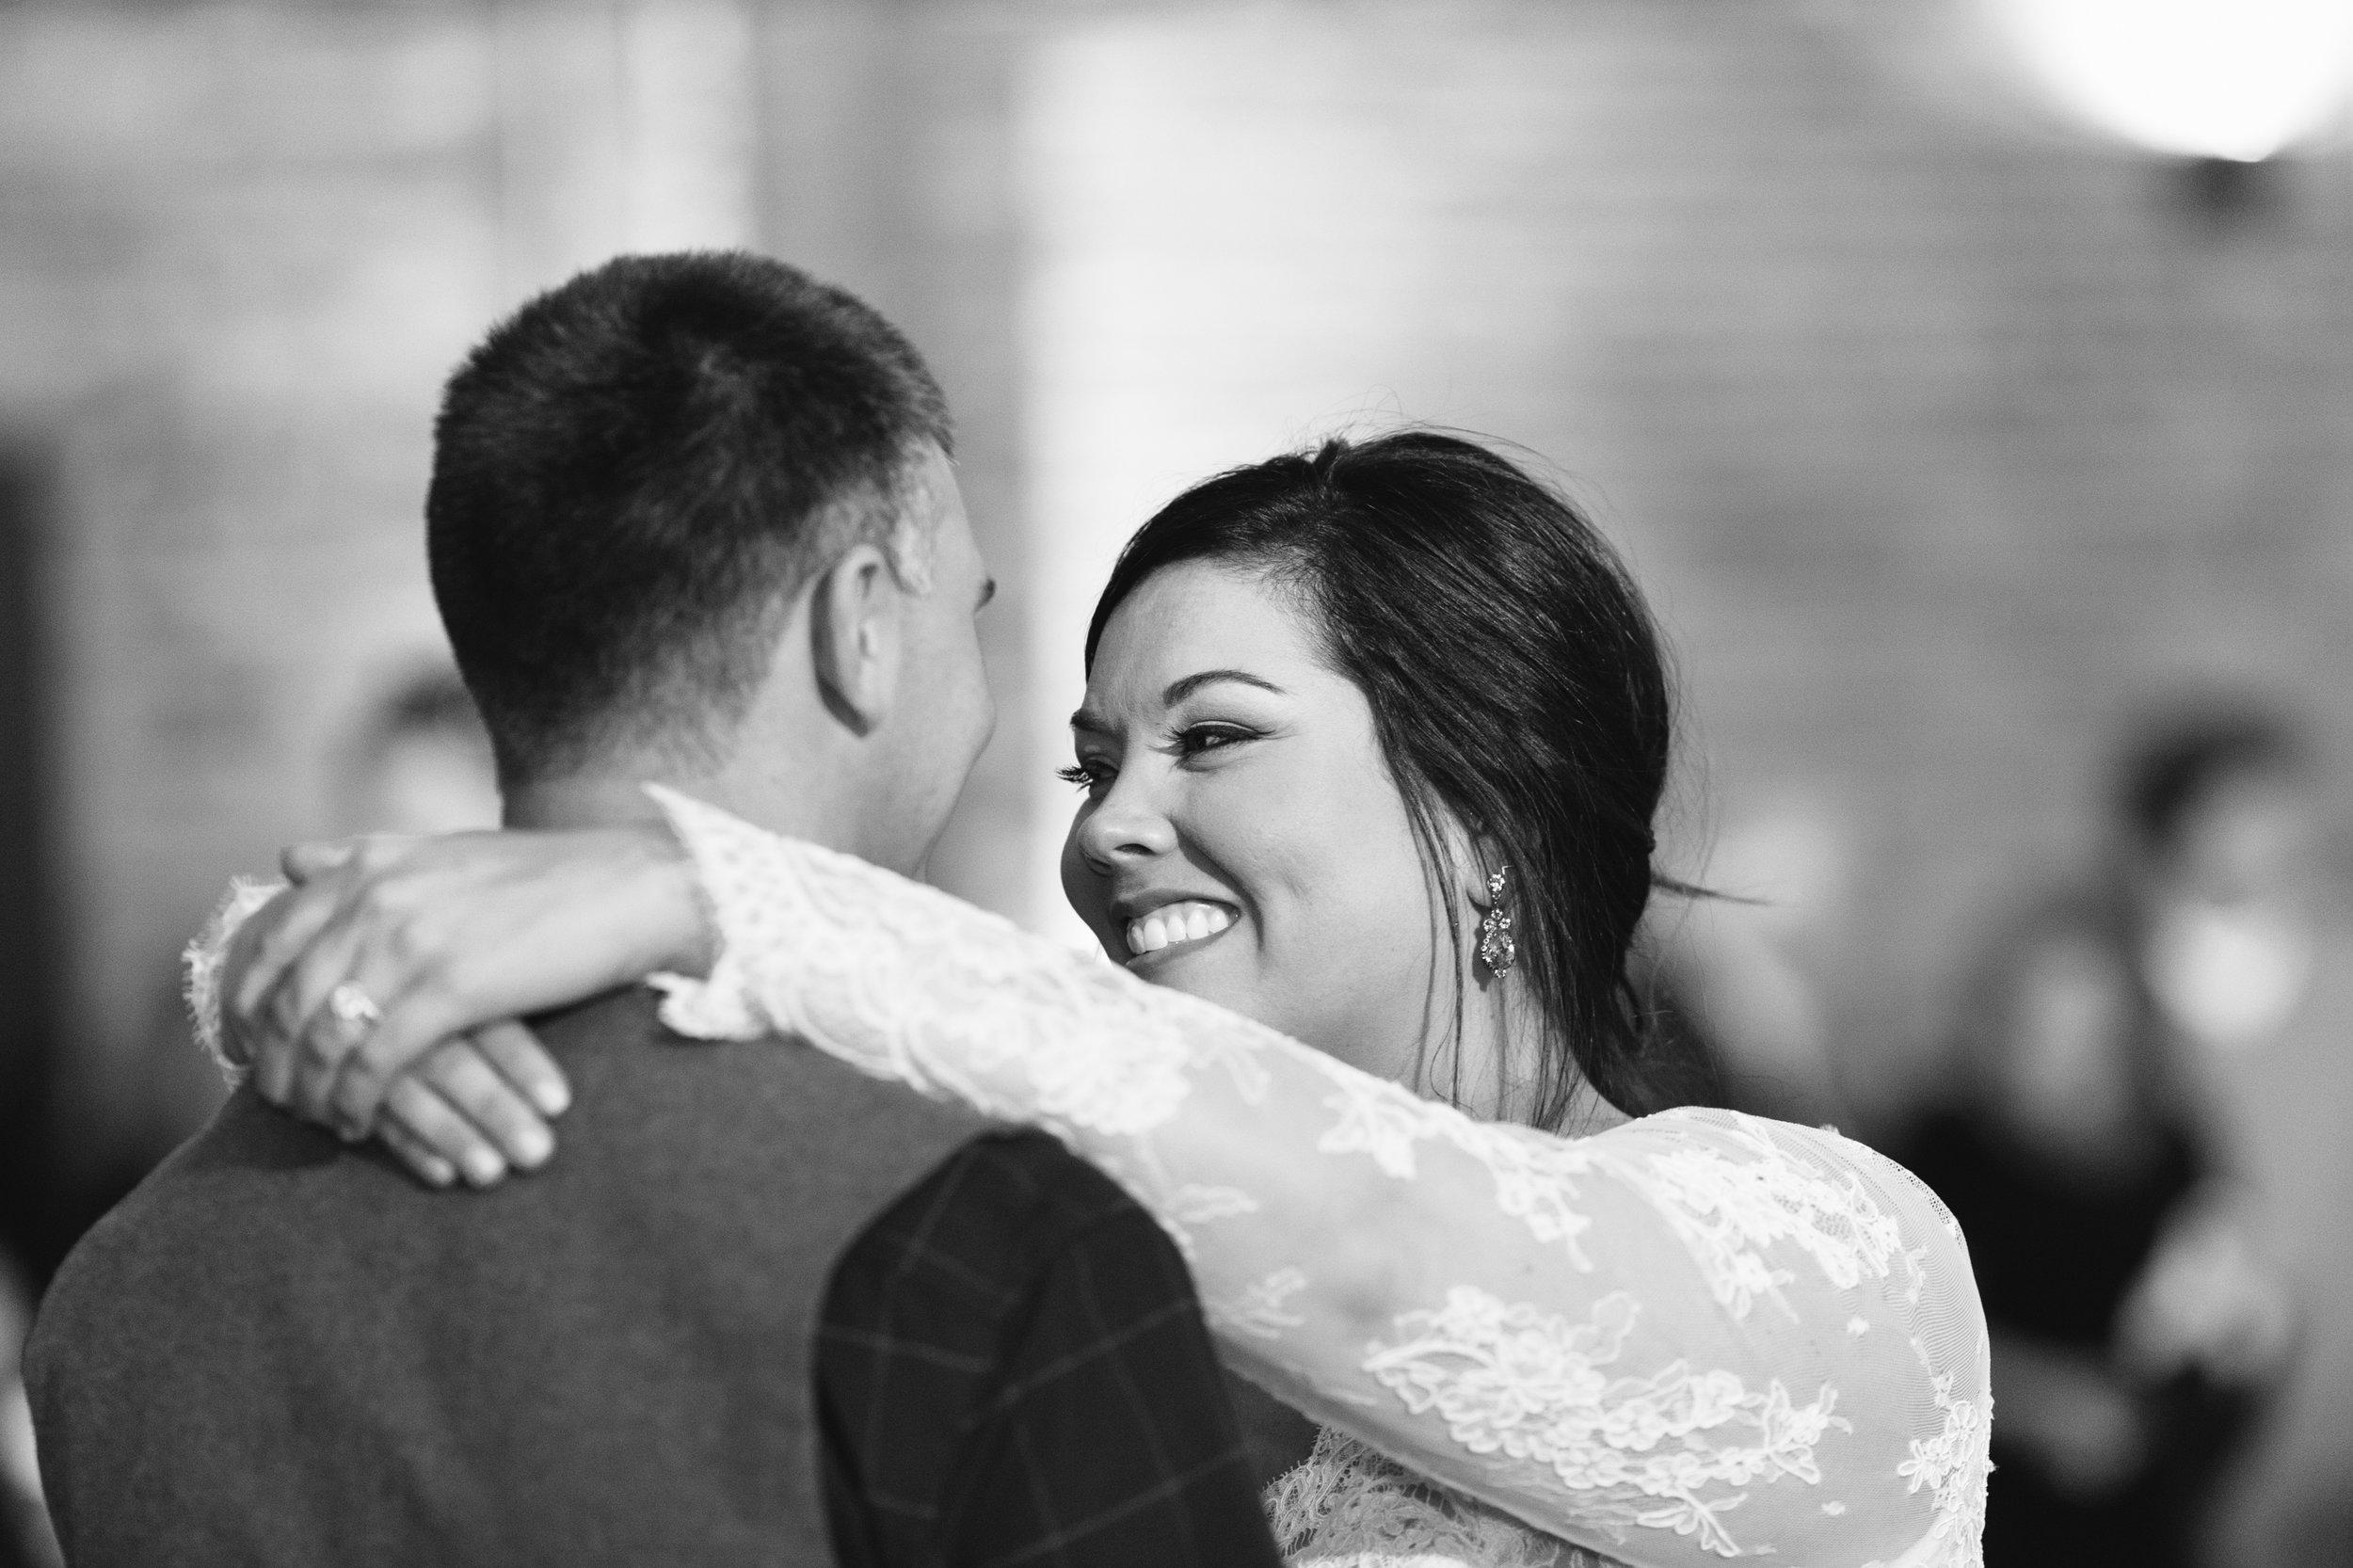 Lauren_Jeremy_Standard_Wedding_Knoxville_Abigail_Malone_Photography_FIlm-537.jpg